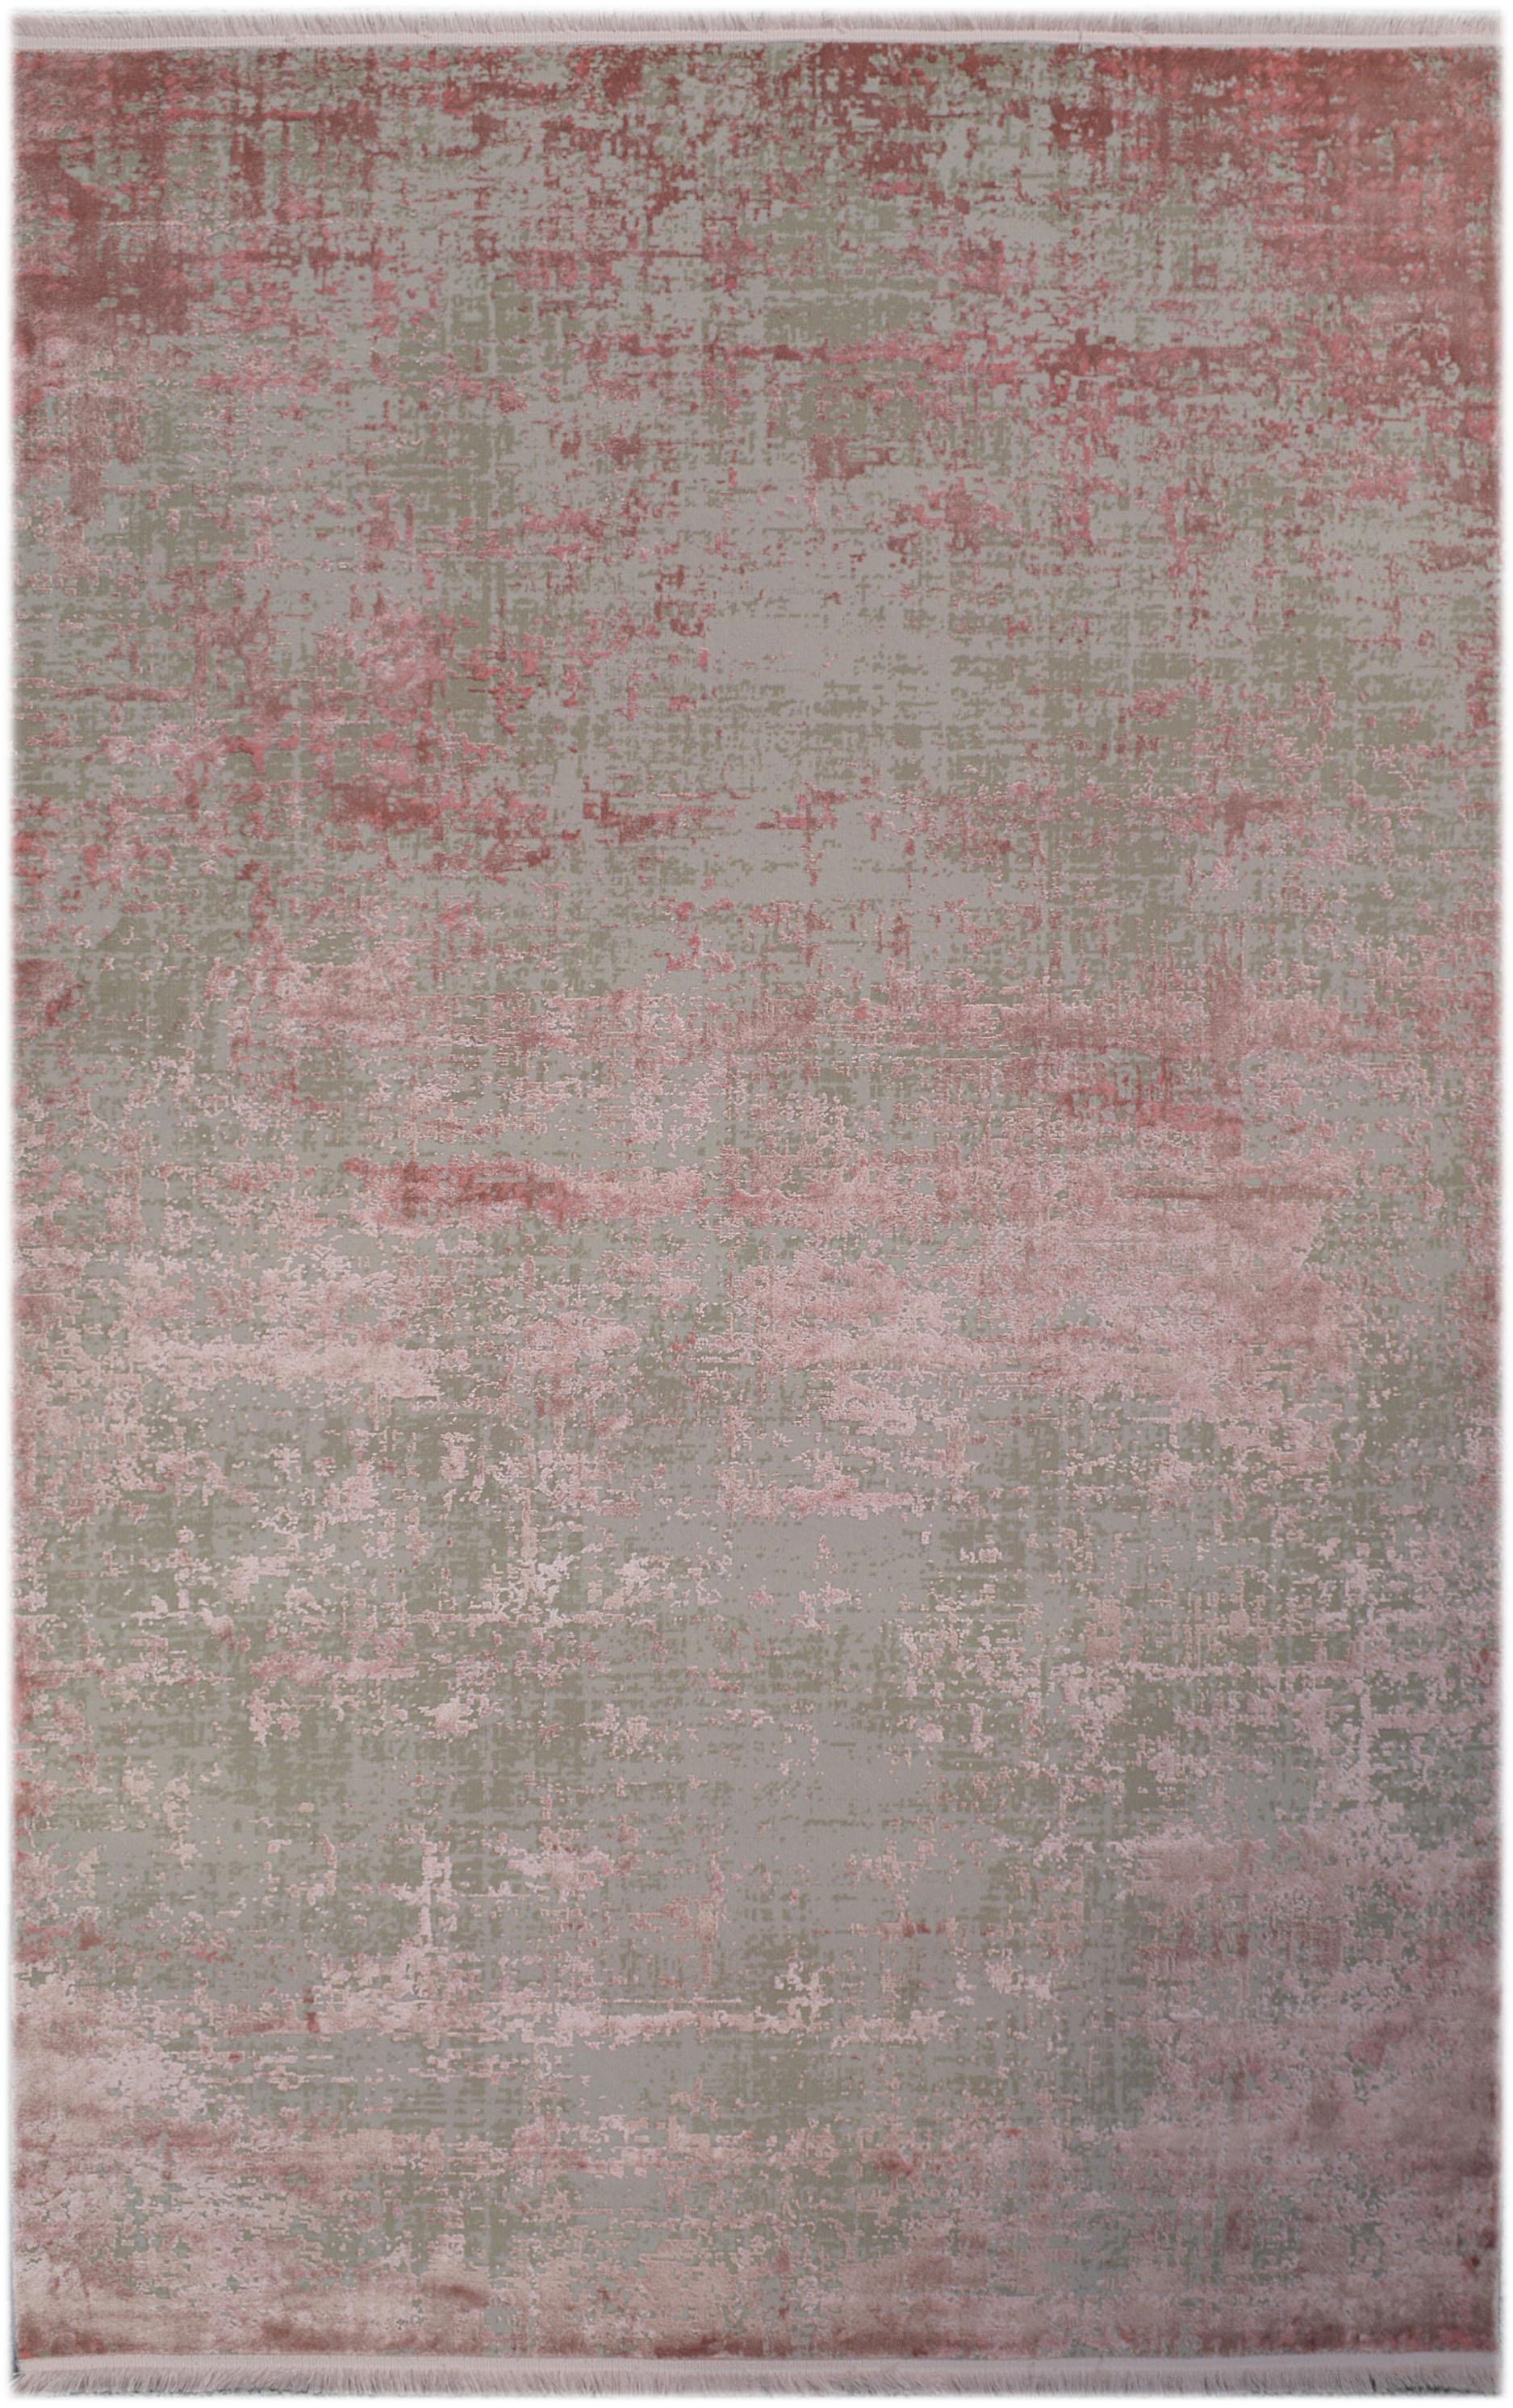 Schimmernder Teppich Cordoba mit Fransen, Vintage Style, Flor: 70% Acryl, 30% Viskose, Grau, Rosatöne, B 200 x L 290 cm (Größe L)